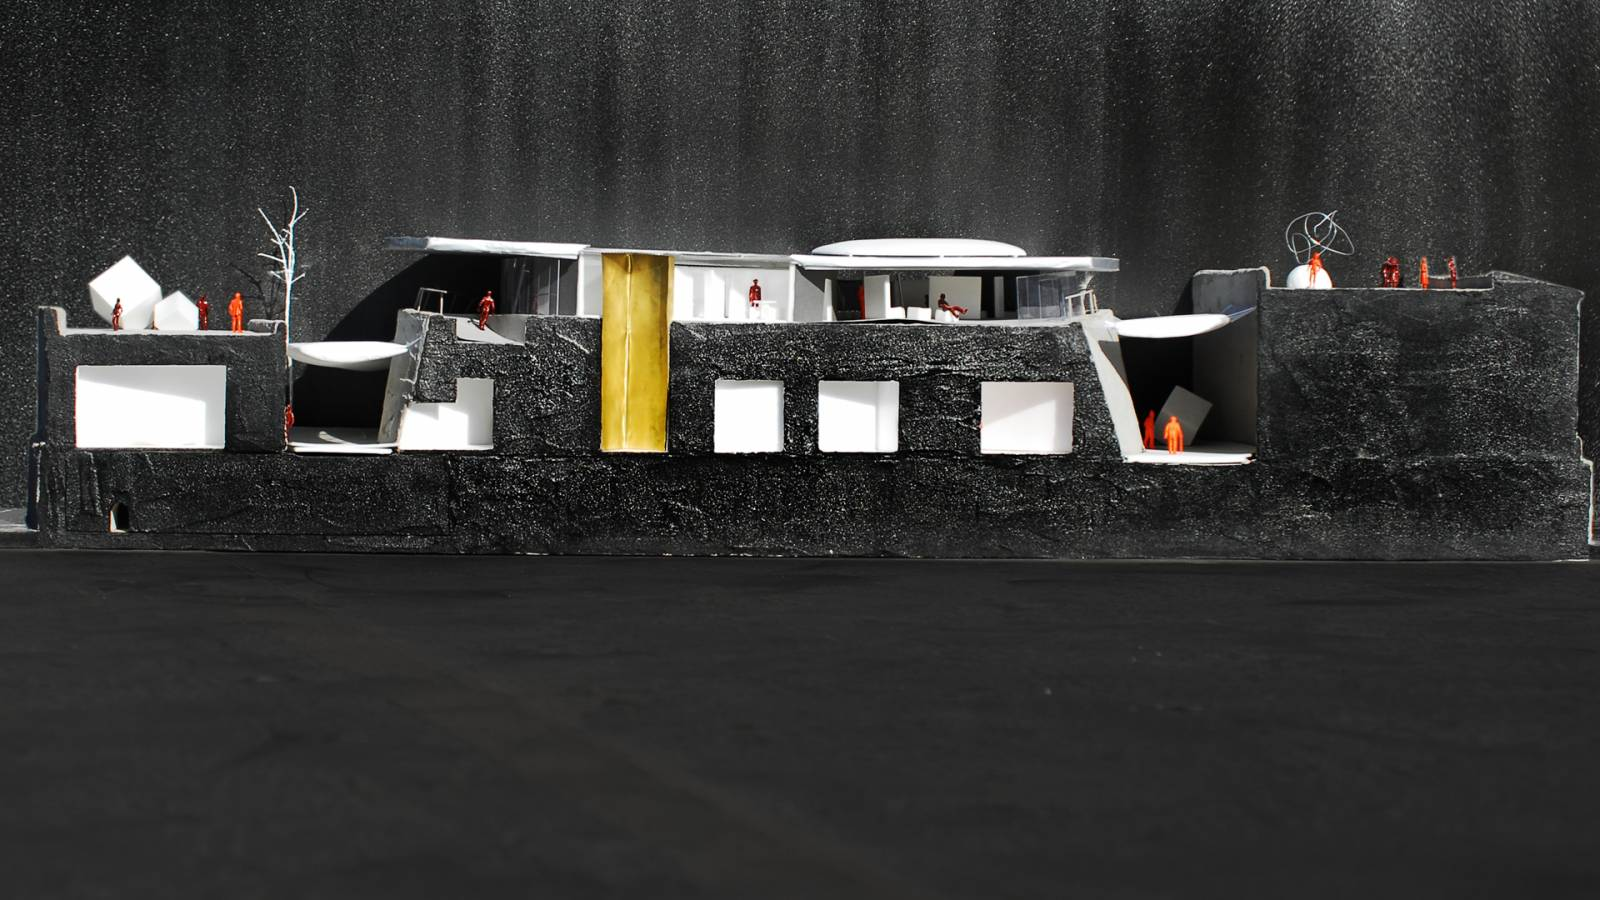 1:50 SECTION MODEL - Forte São Marcelo - SPOL Architects